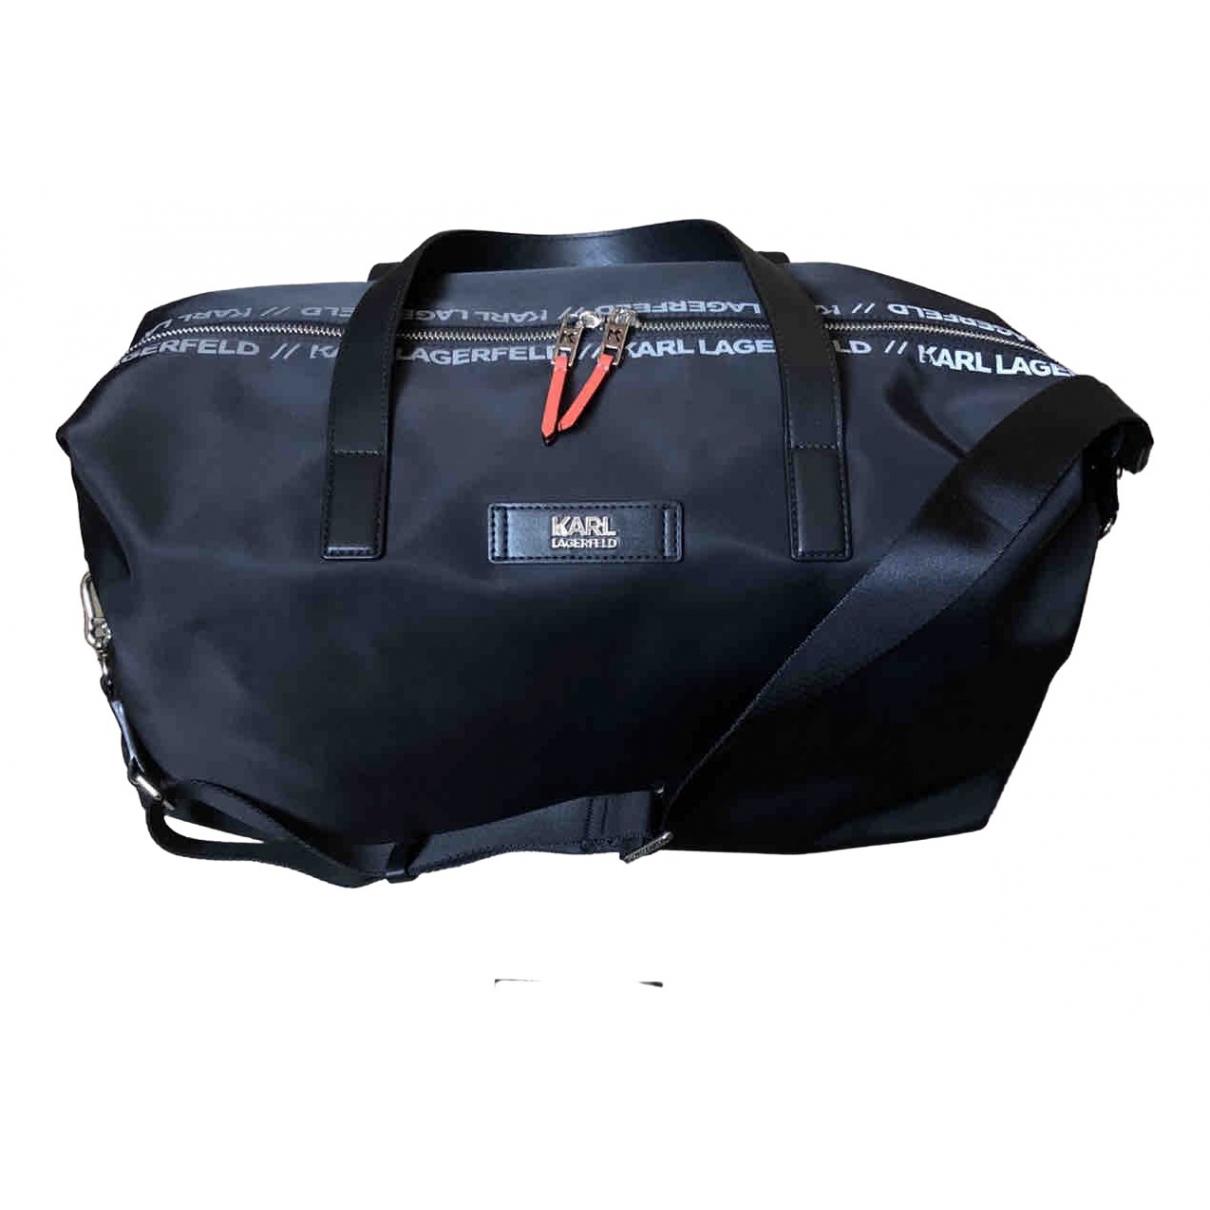 Karl Lagerfeld \N Black Travel bag for Women \N